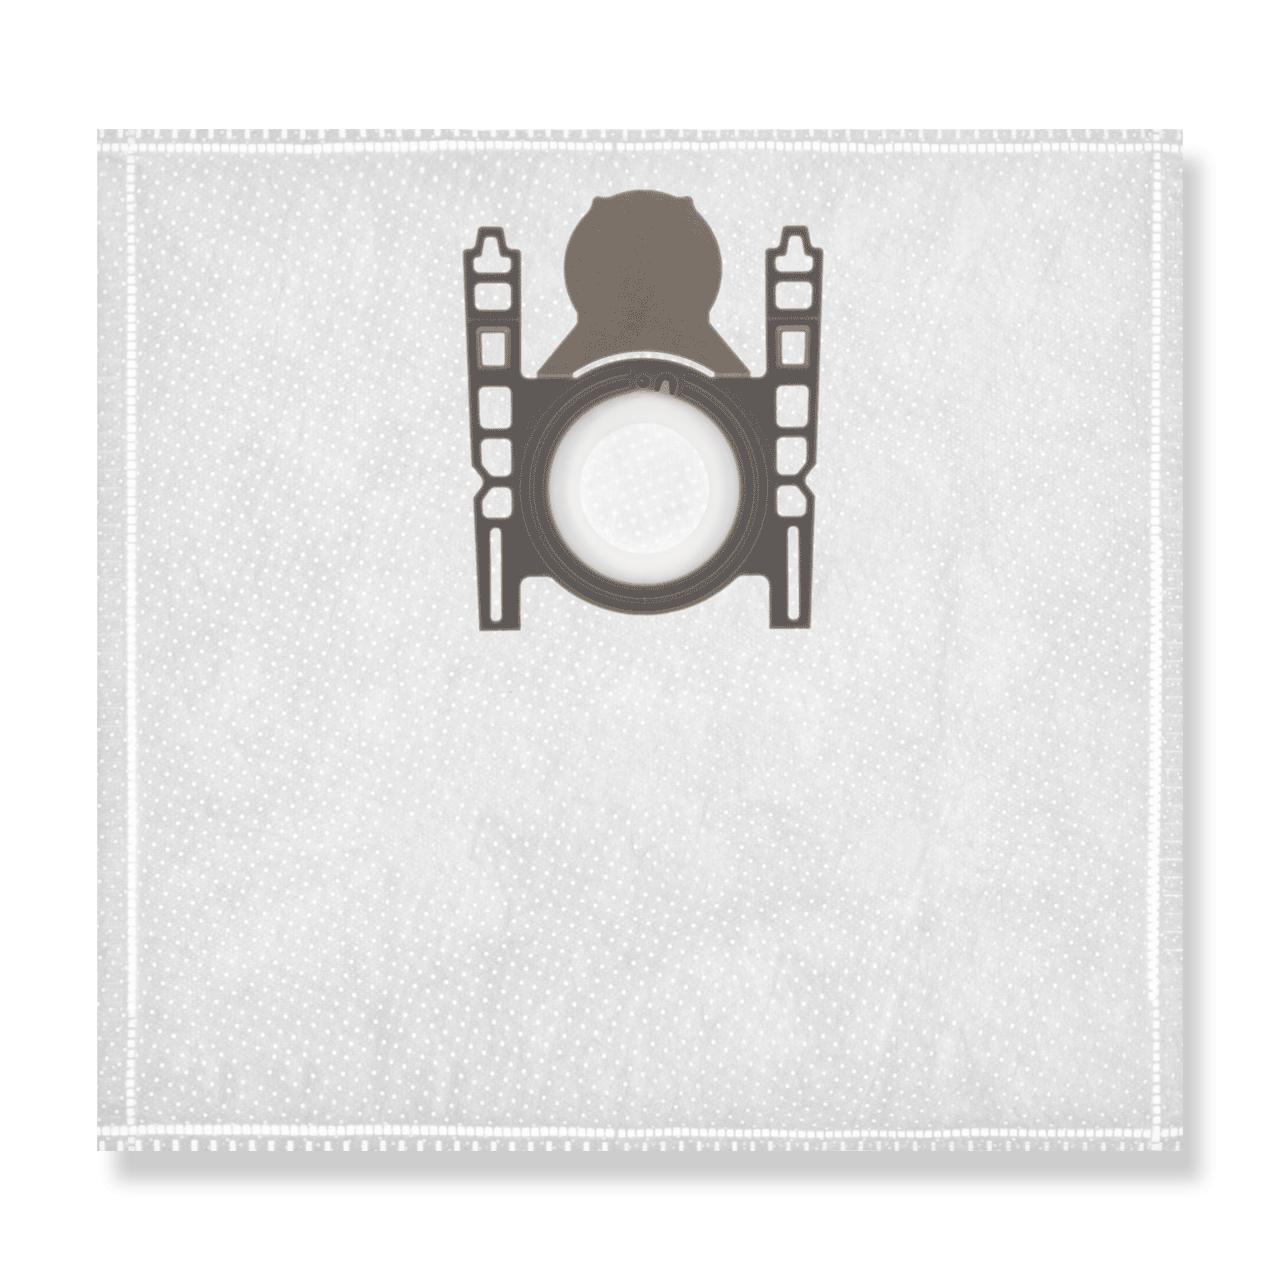 staubsaugerbeutel f r siemens z 3 staubsaugerbeutel spezialist. Black Bedroom Furniture Sets. Home Design Ideas